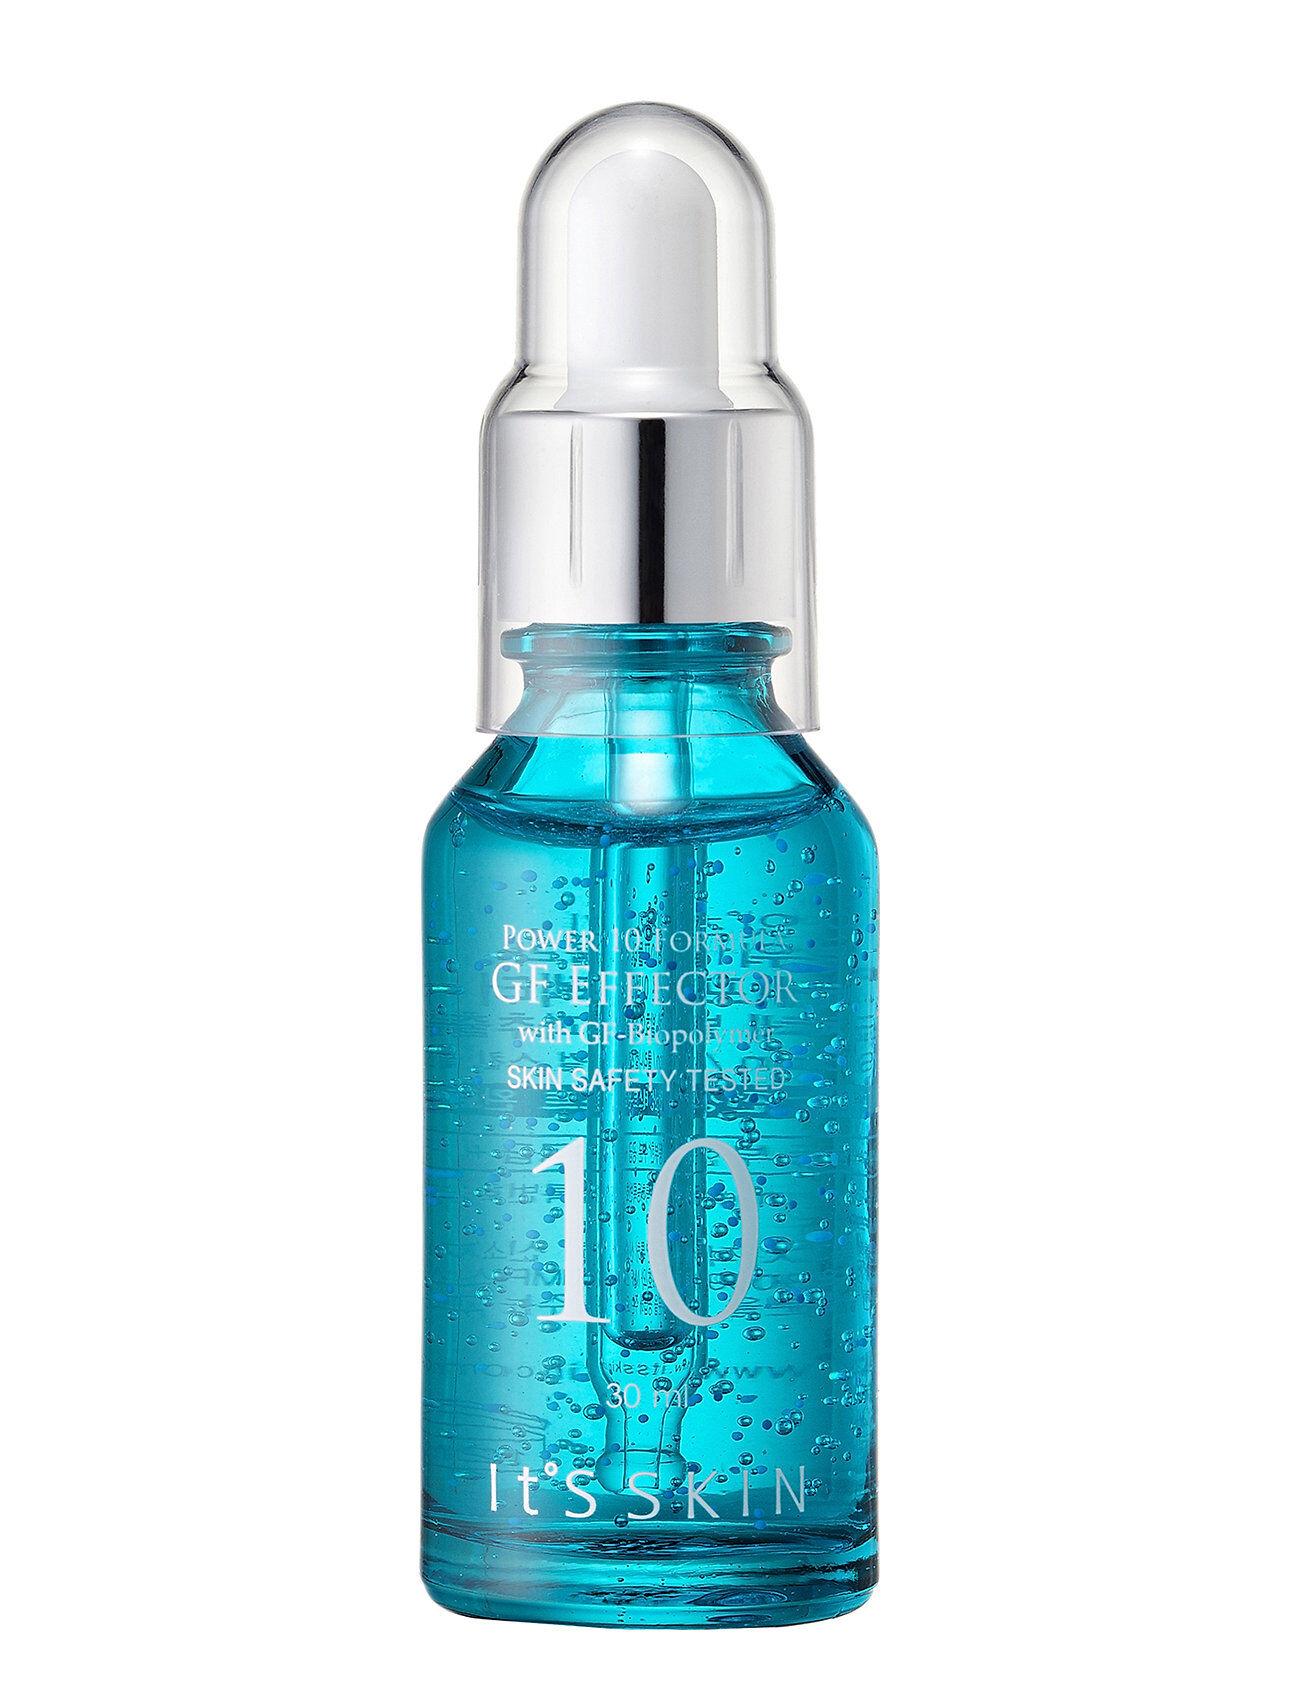 It'S SKIN It´S Skin Power 10 Formula Gf Effector Serum Seerumi Kasvot Ihonhoito Nude It'S SKIN